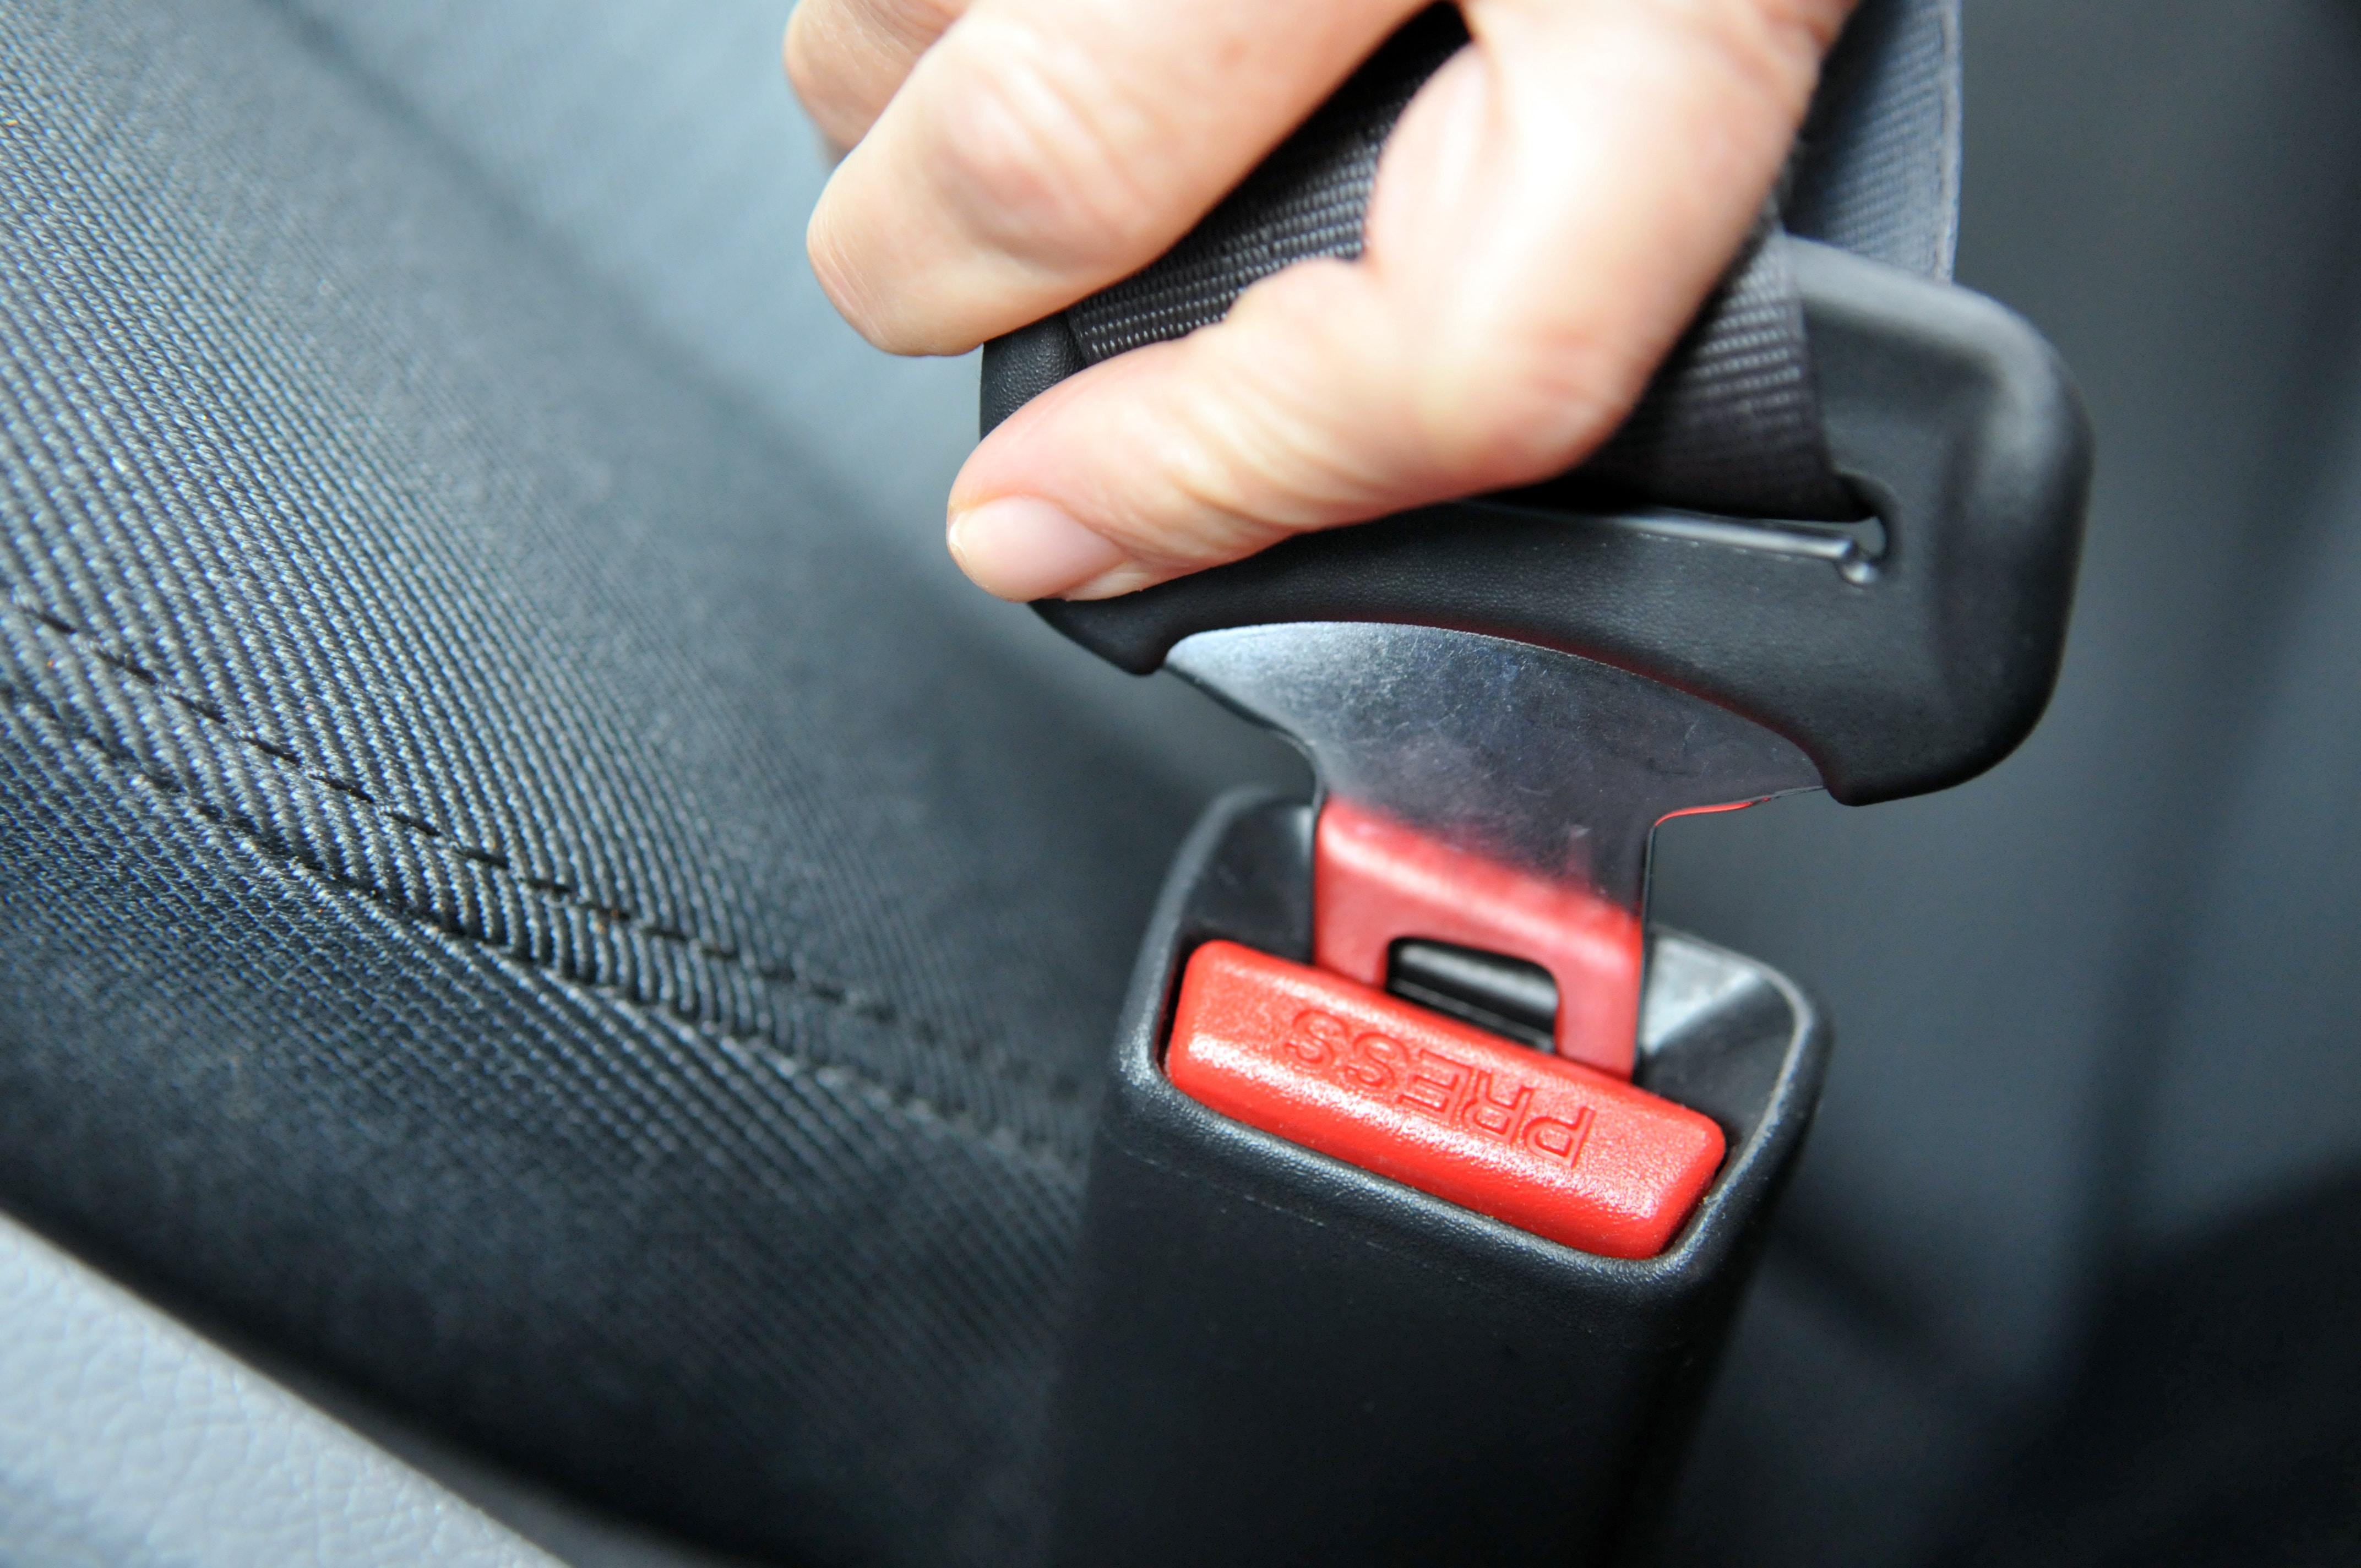 Seatbelt BCJ Plastic Products